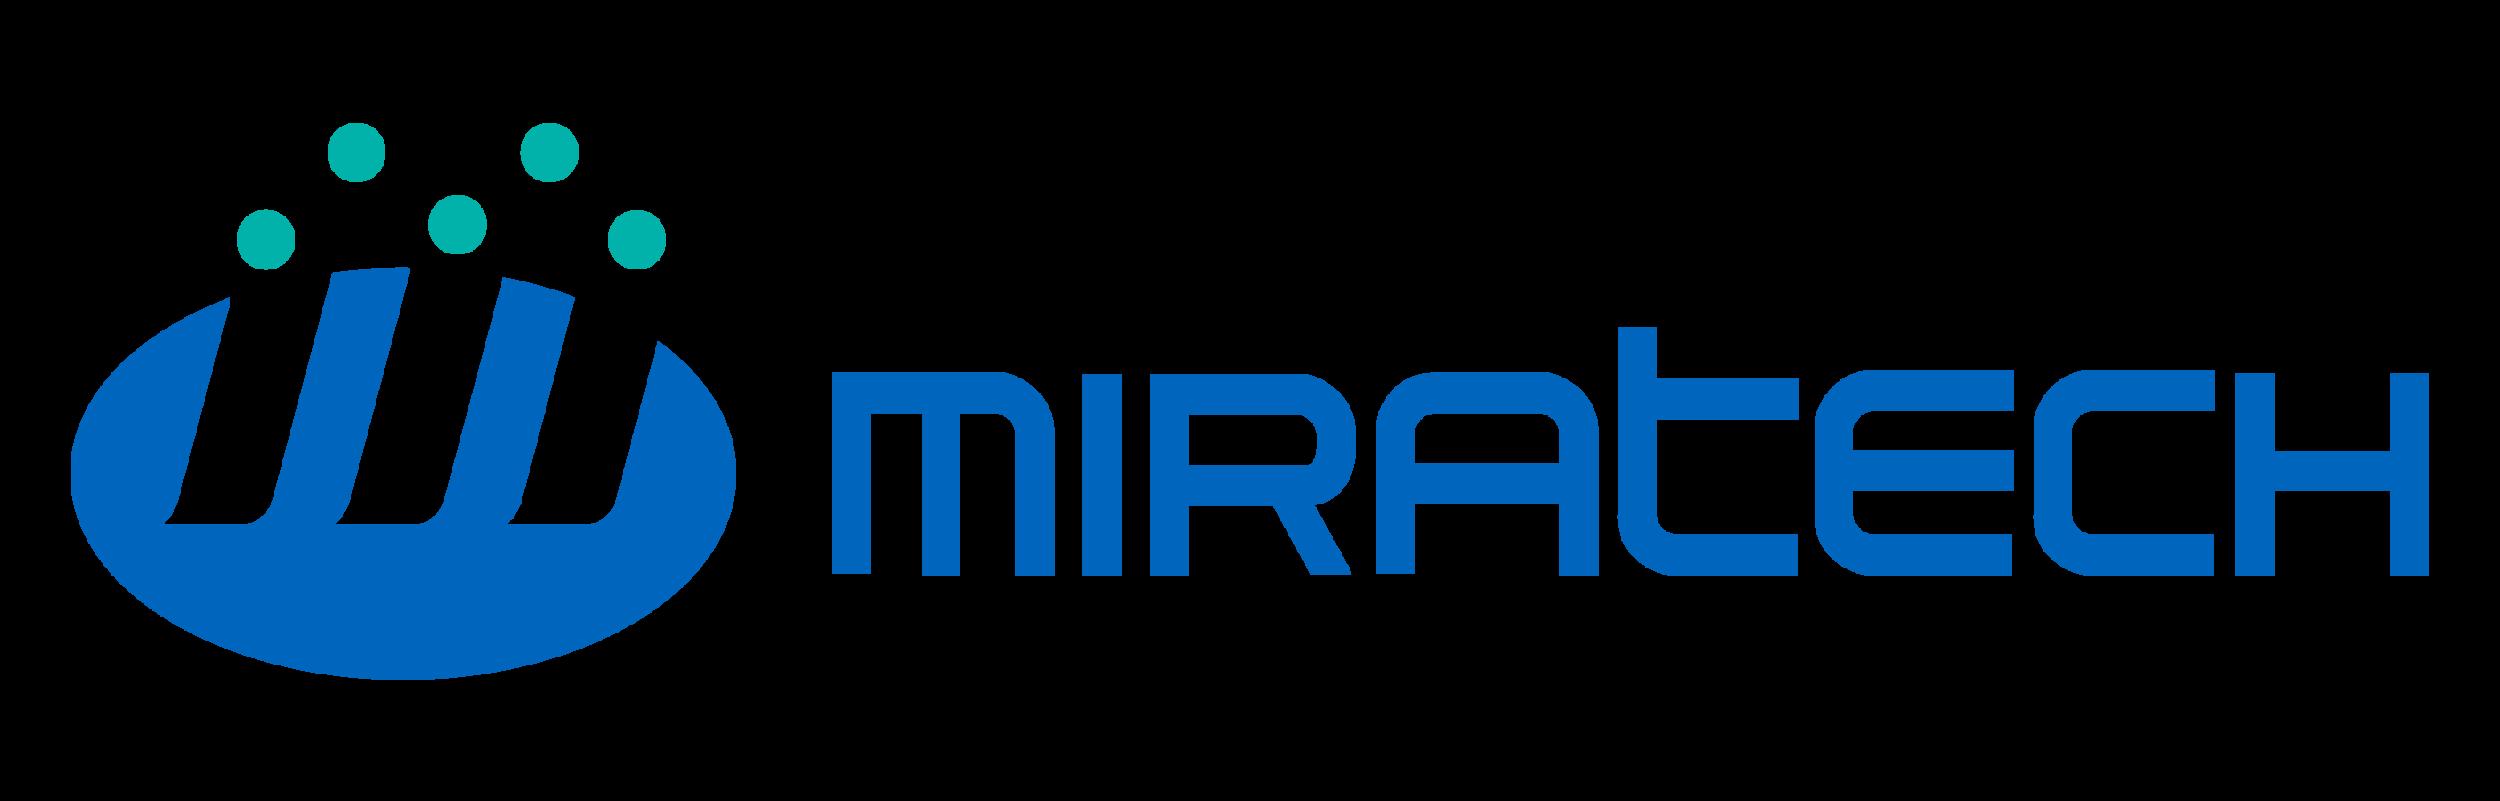 MIRATECH Logo 01.png